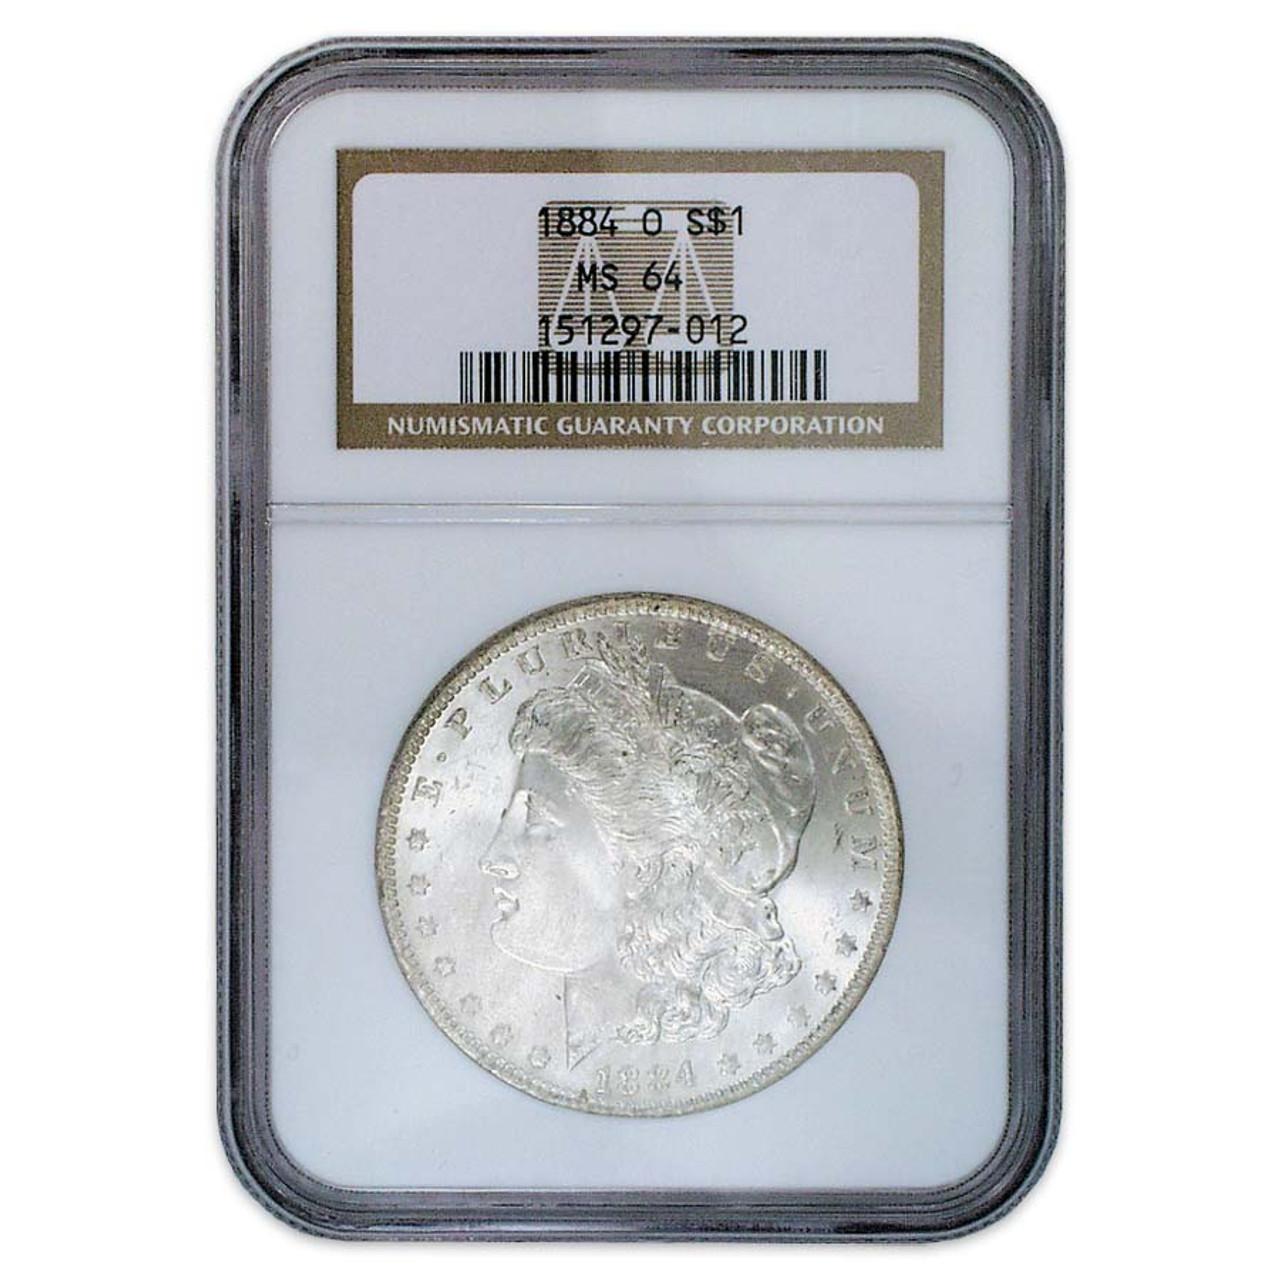 1884-O Morgan Silver Dollar Certified MS-64 Image 1